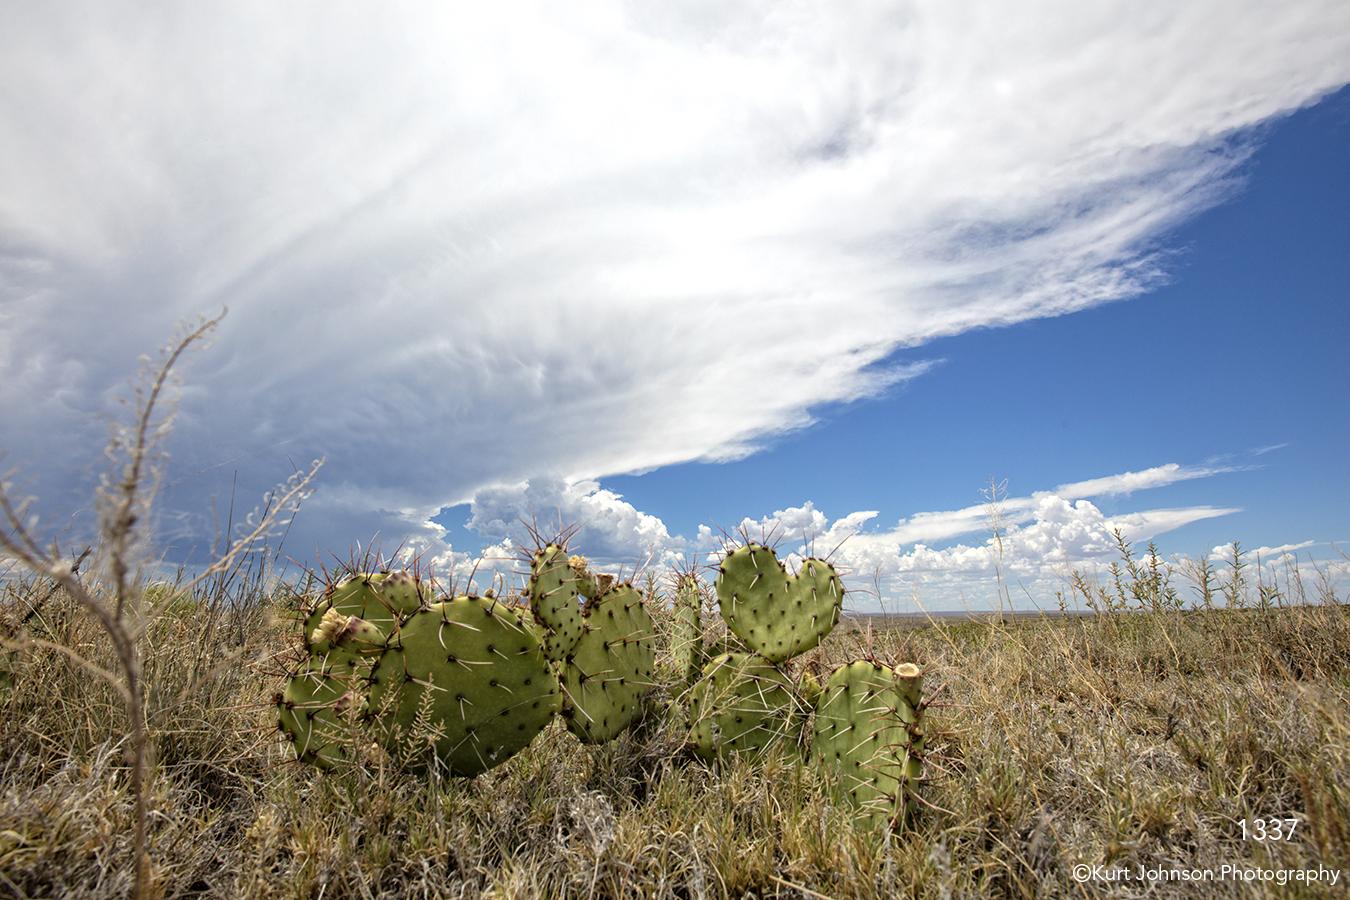 southwest landscape clouds big sky desert cactus green